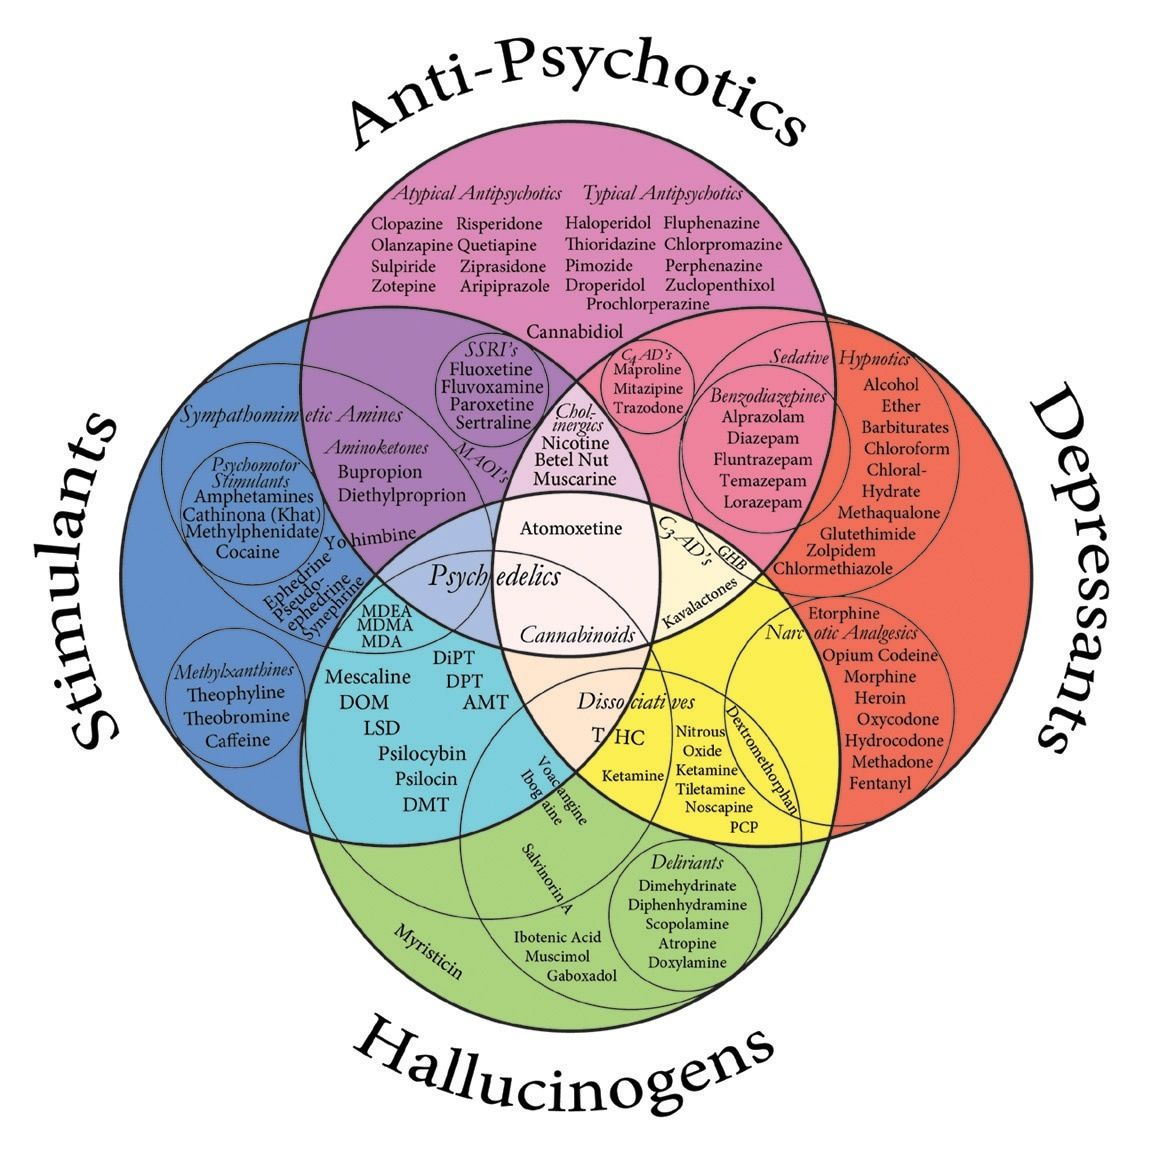 c7034a0ad324e51003c50edad3710268 helpful diagram nursing pinterest mental health, social work